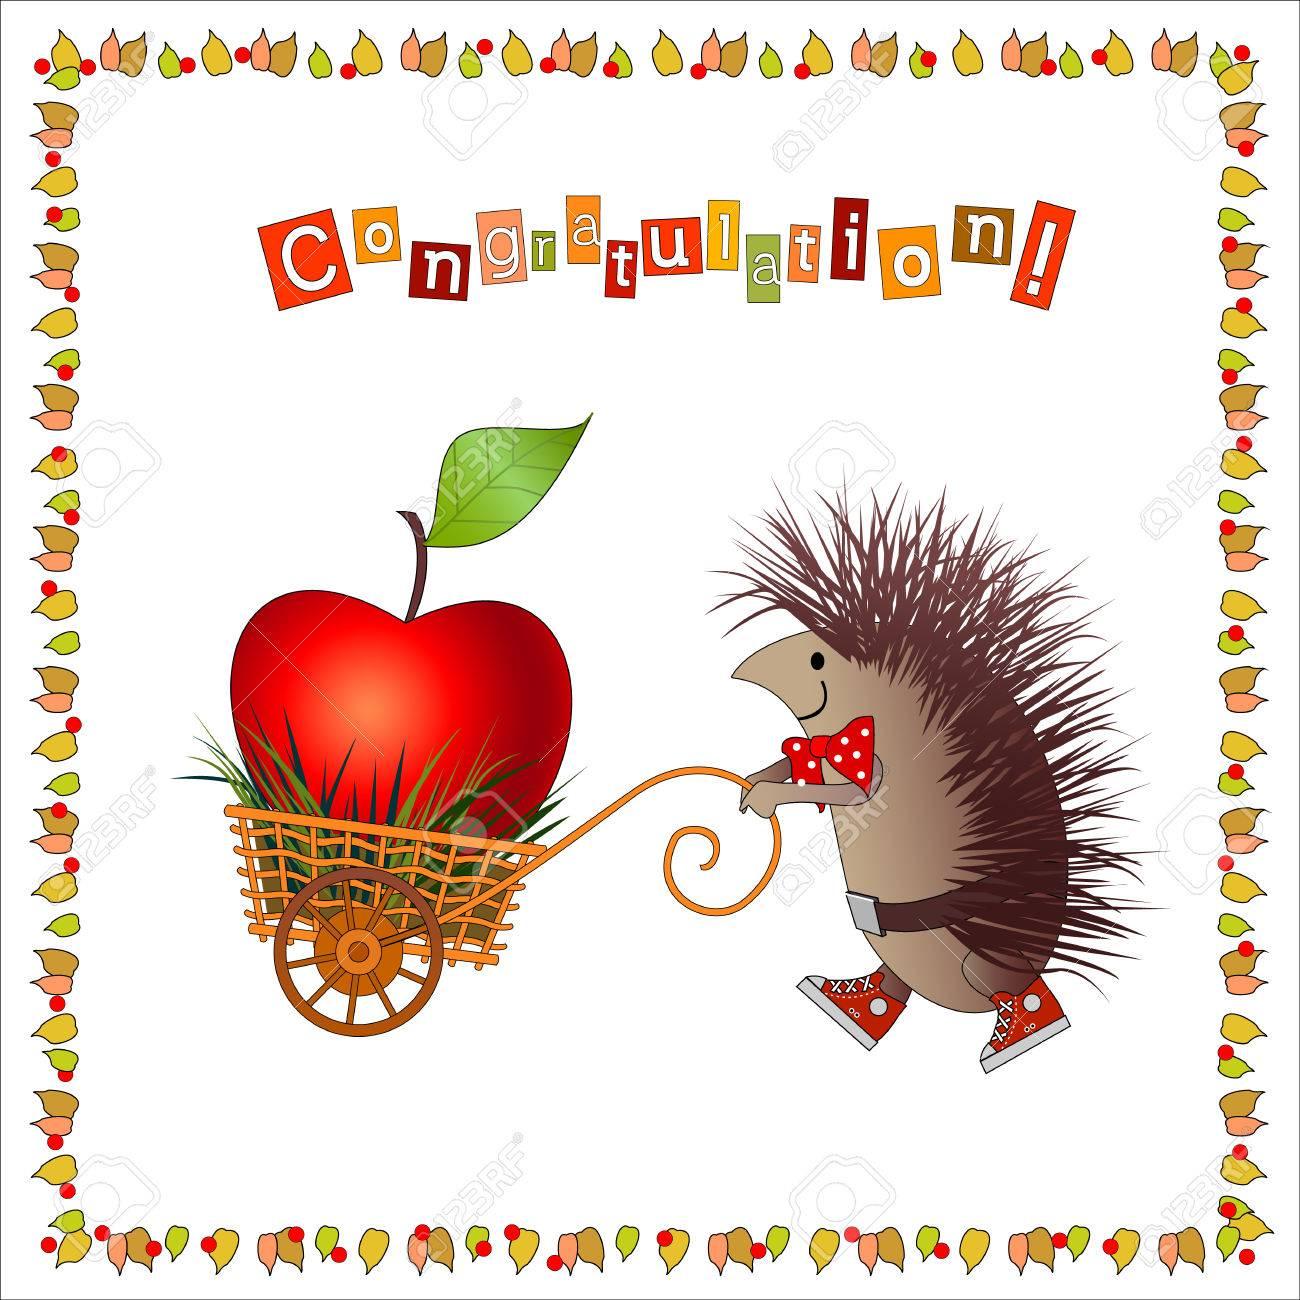 cartoon hedgehog carries big apple in nice handcart frame consist